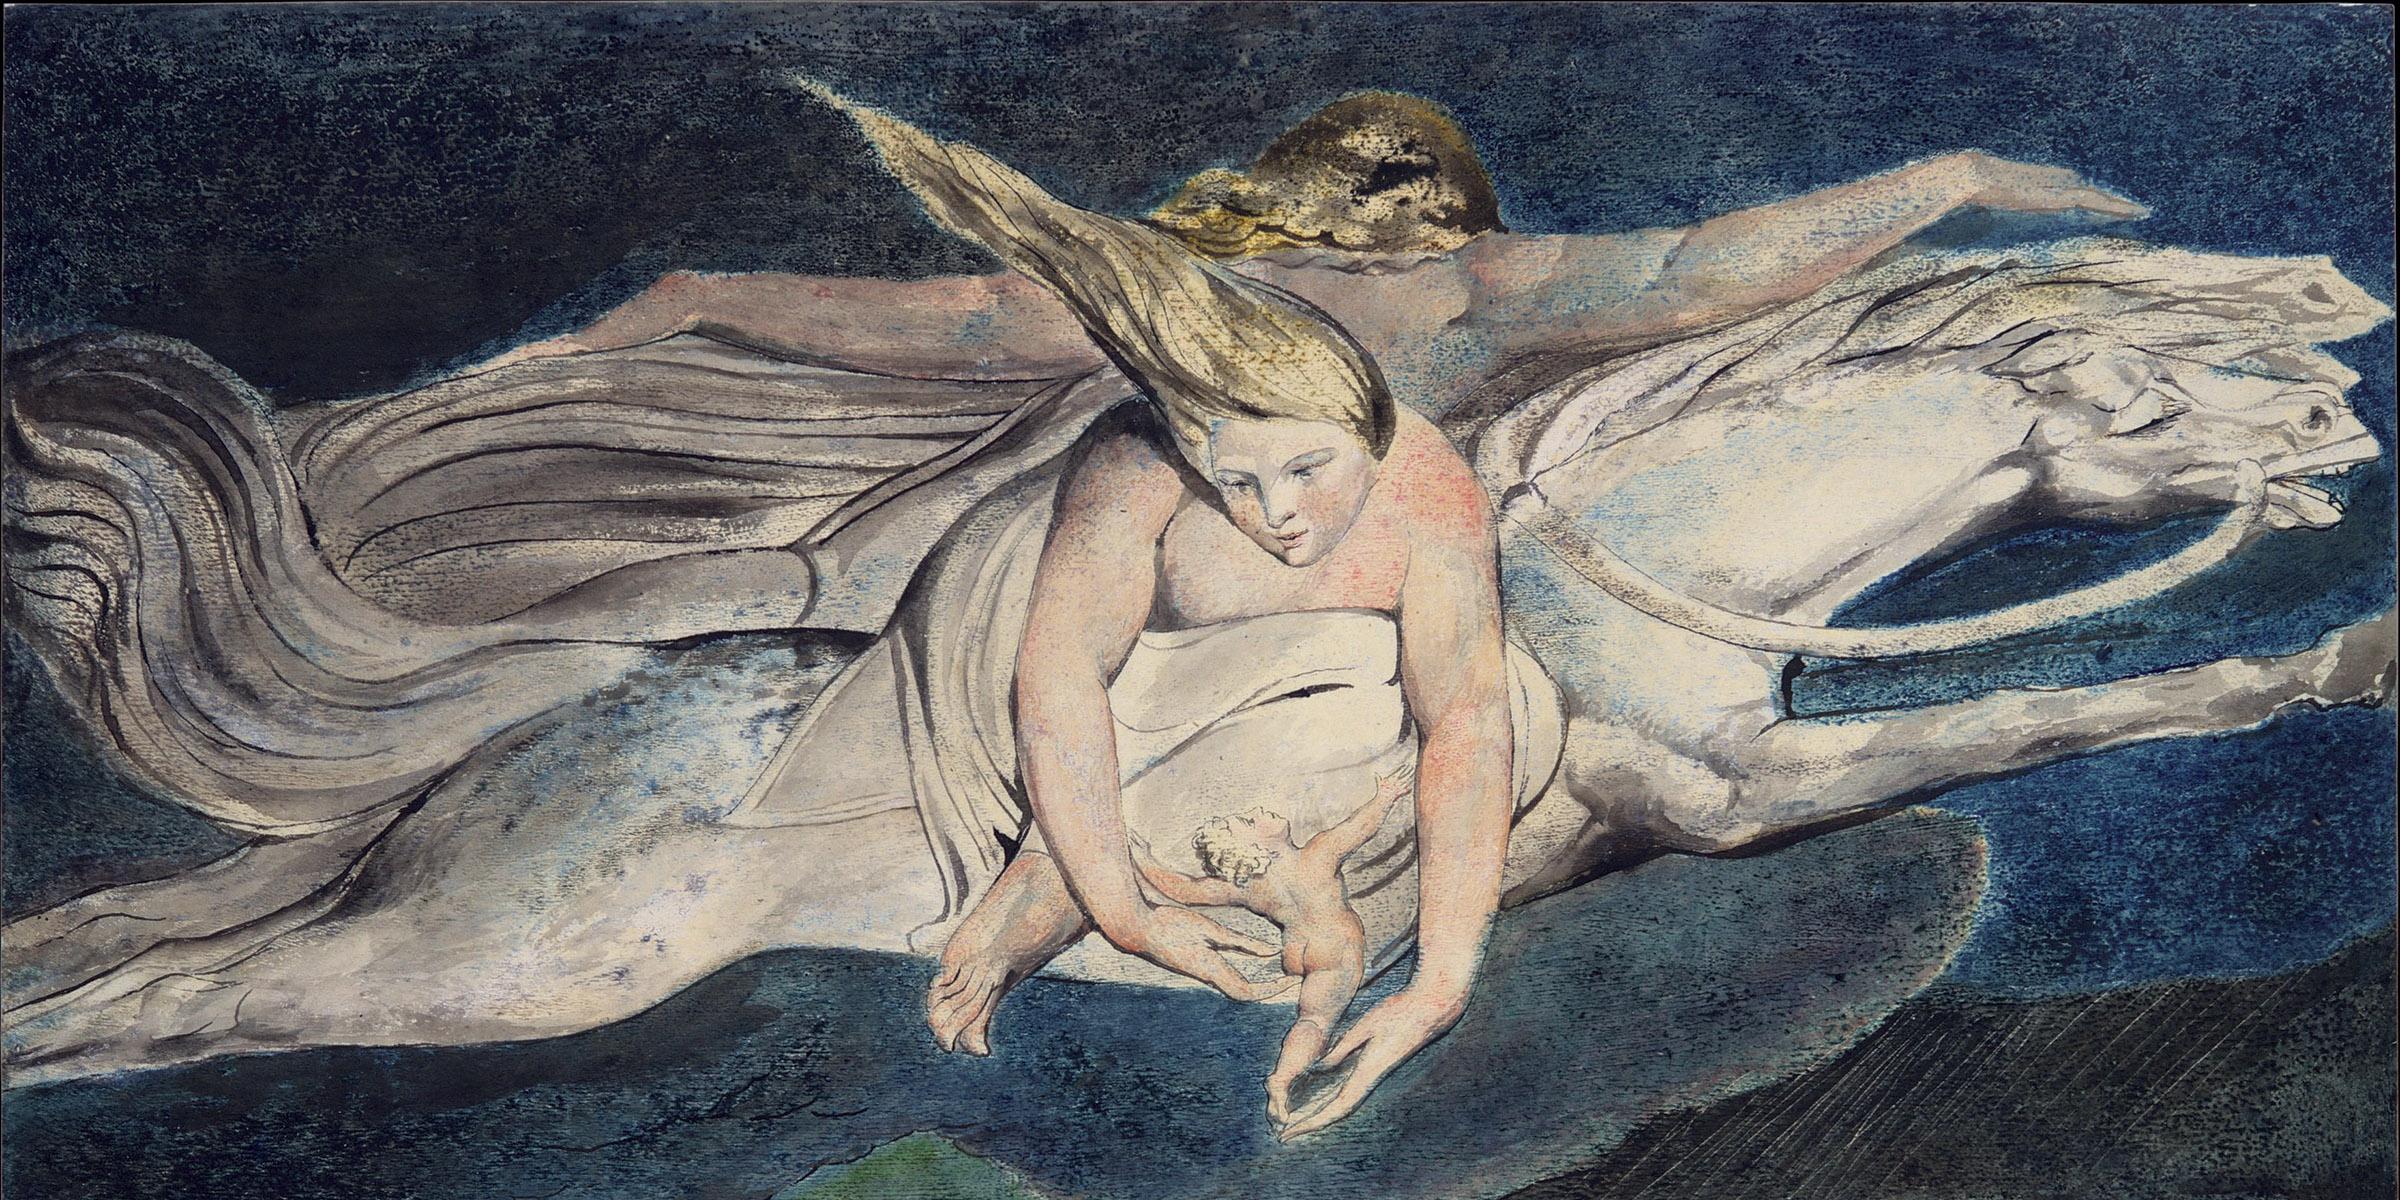 Pity, by William Blake, c. 1795.